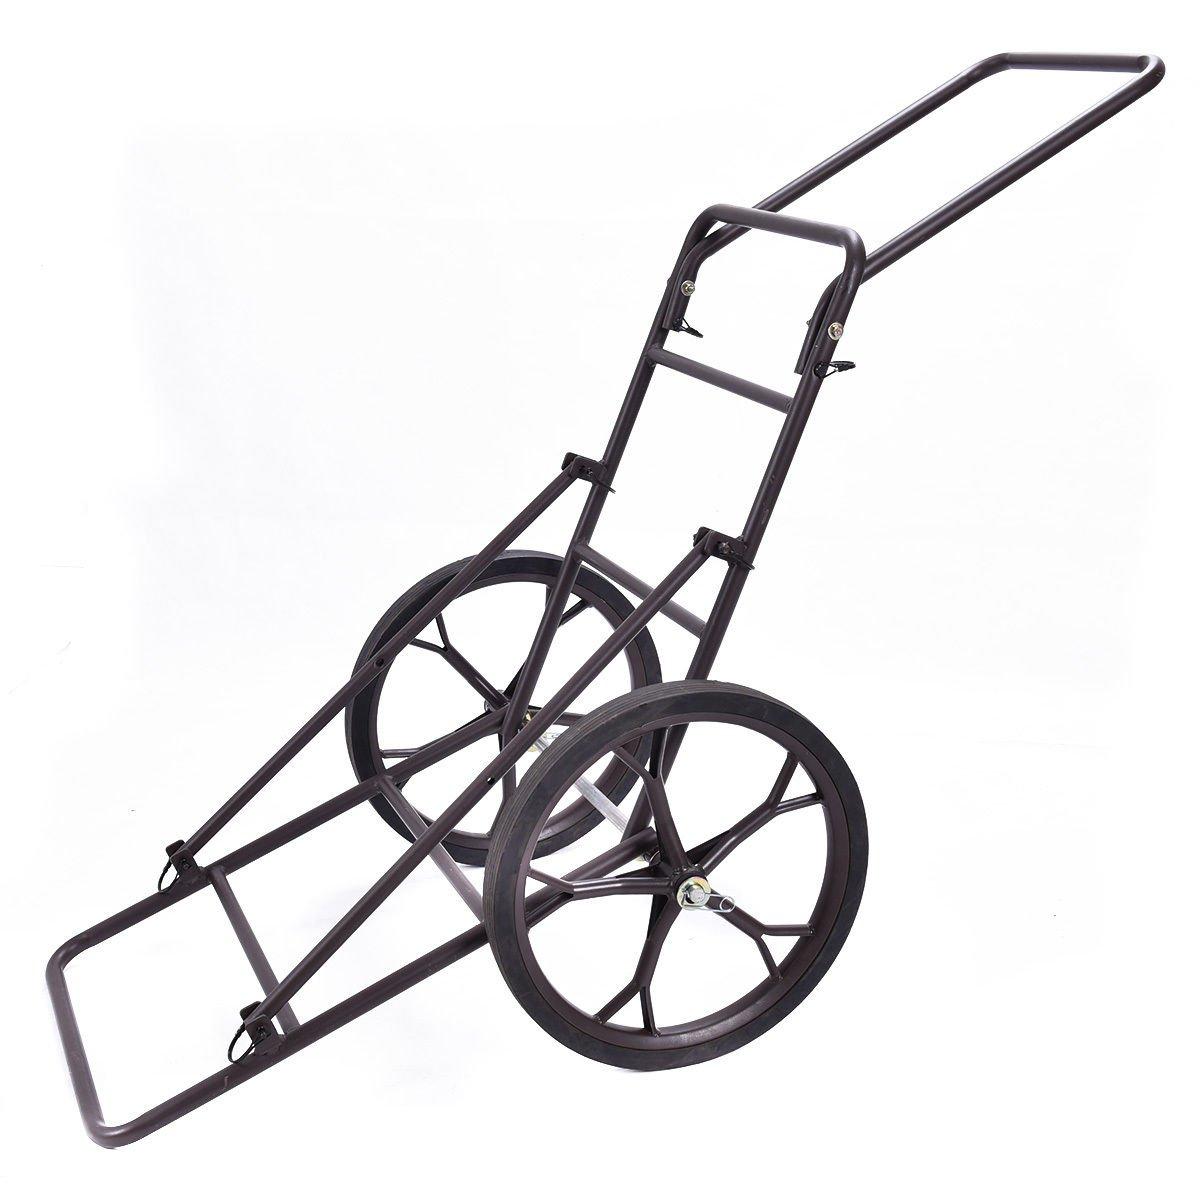 lunanice Folding Deer Cart Larger Capacity 500lbs Hauler Utility Gear Dolly Cart Hunting